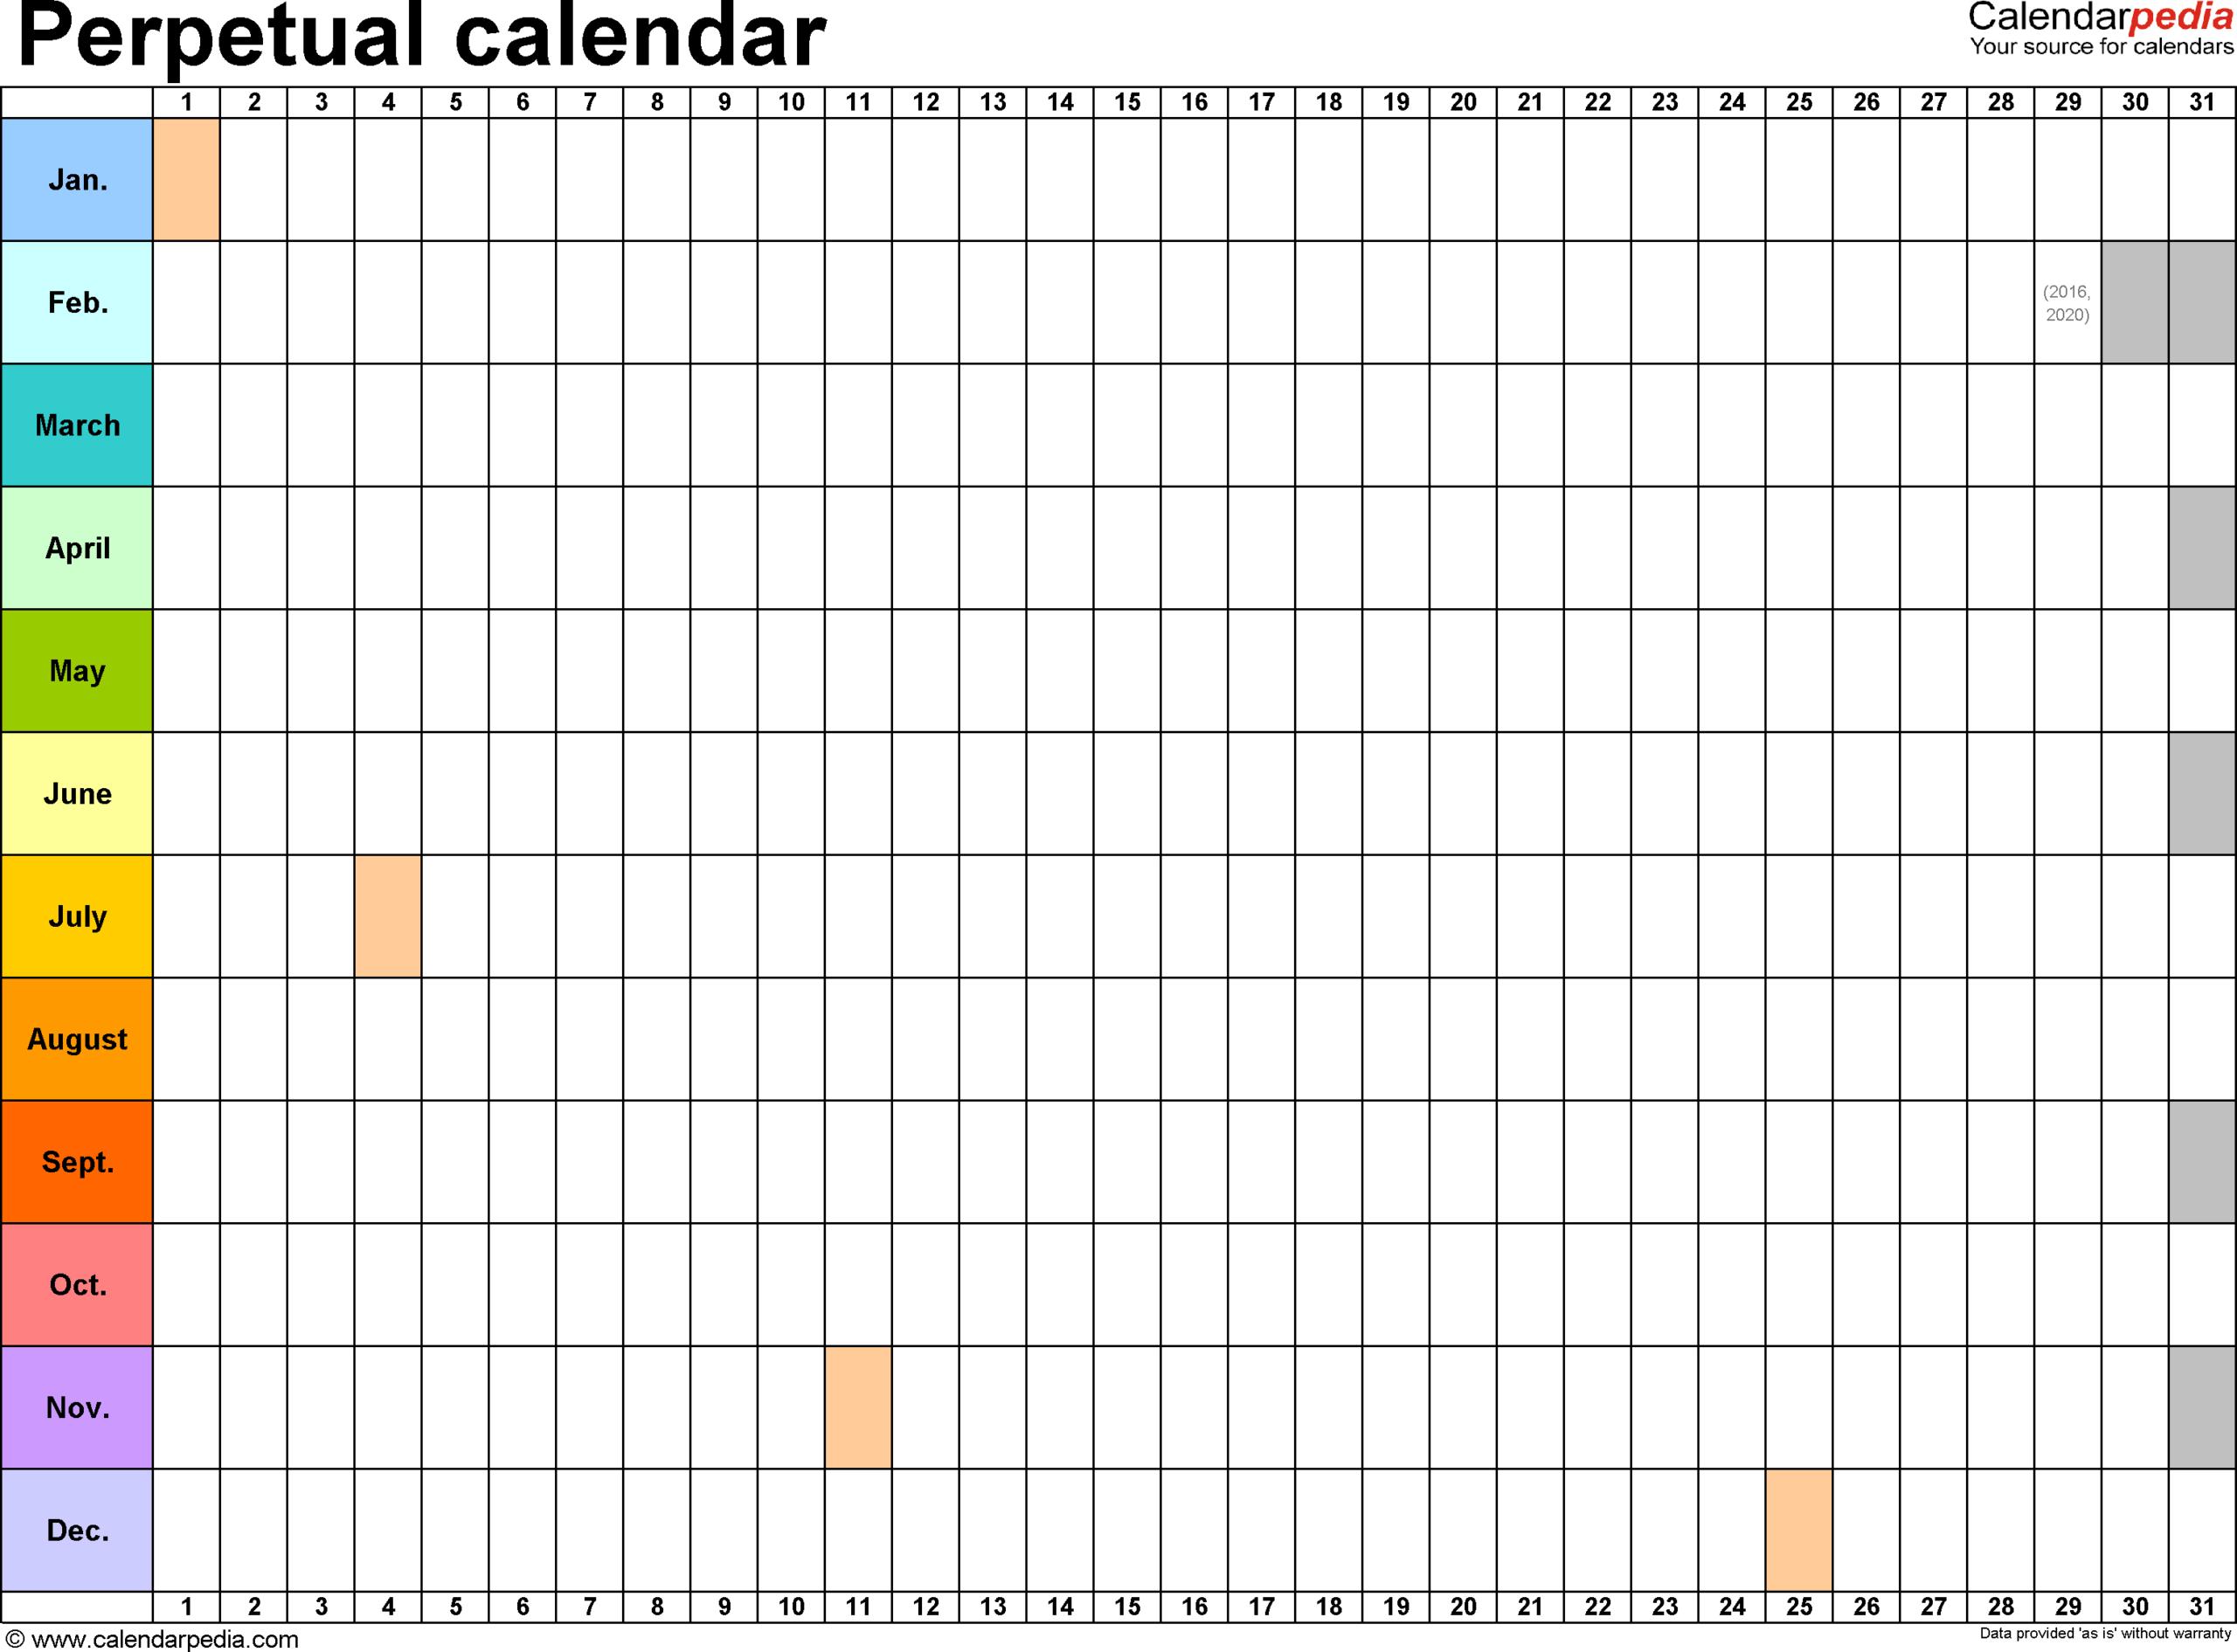 Perpetual Calendars  7 Free Printable Word Templates regarding Free Perpetual Calendar Printable